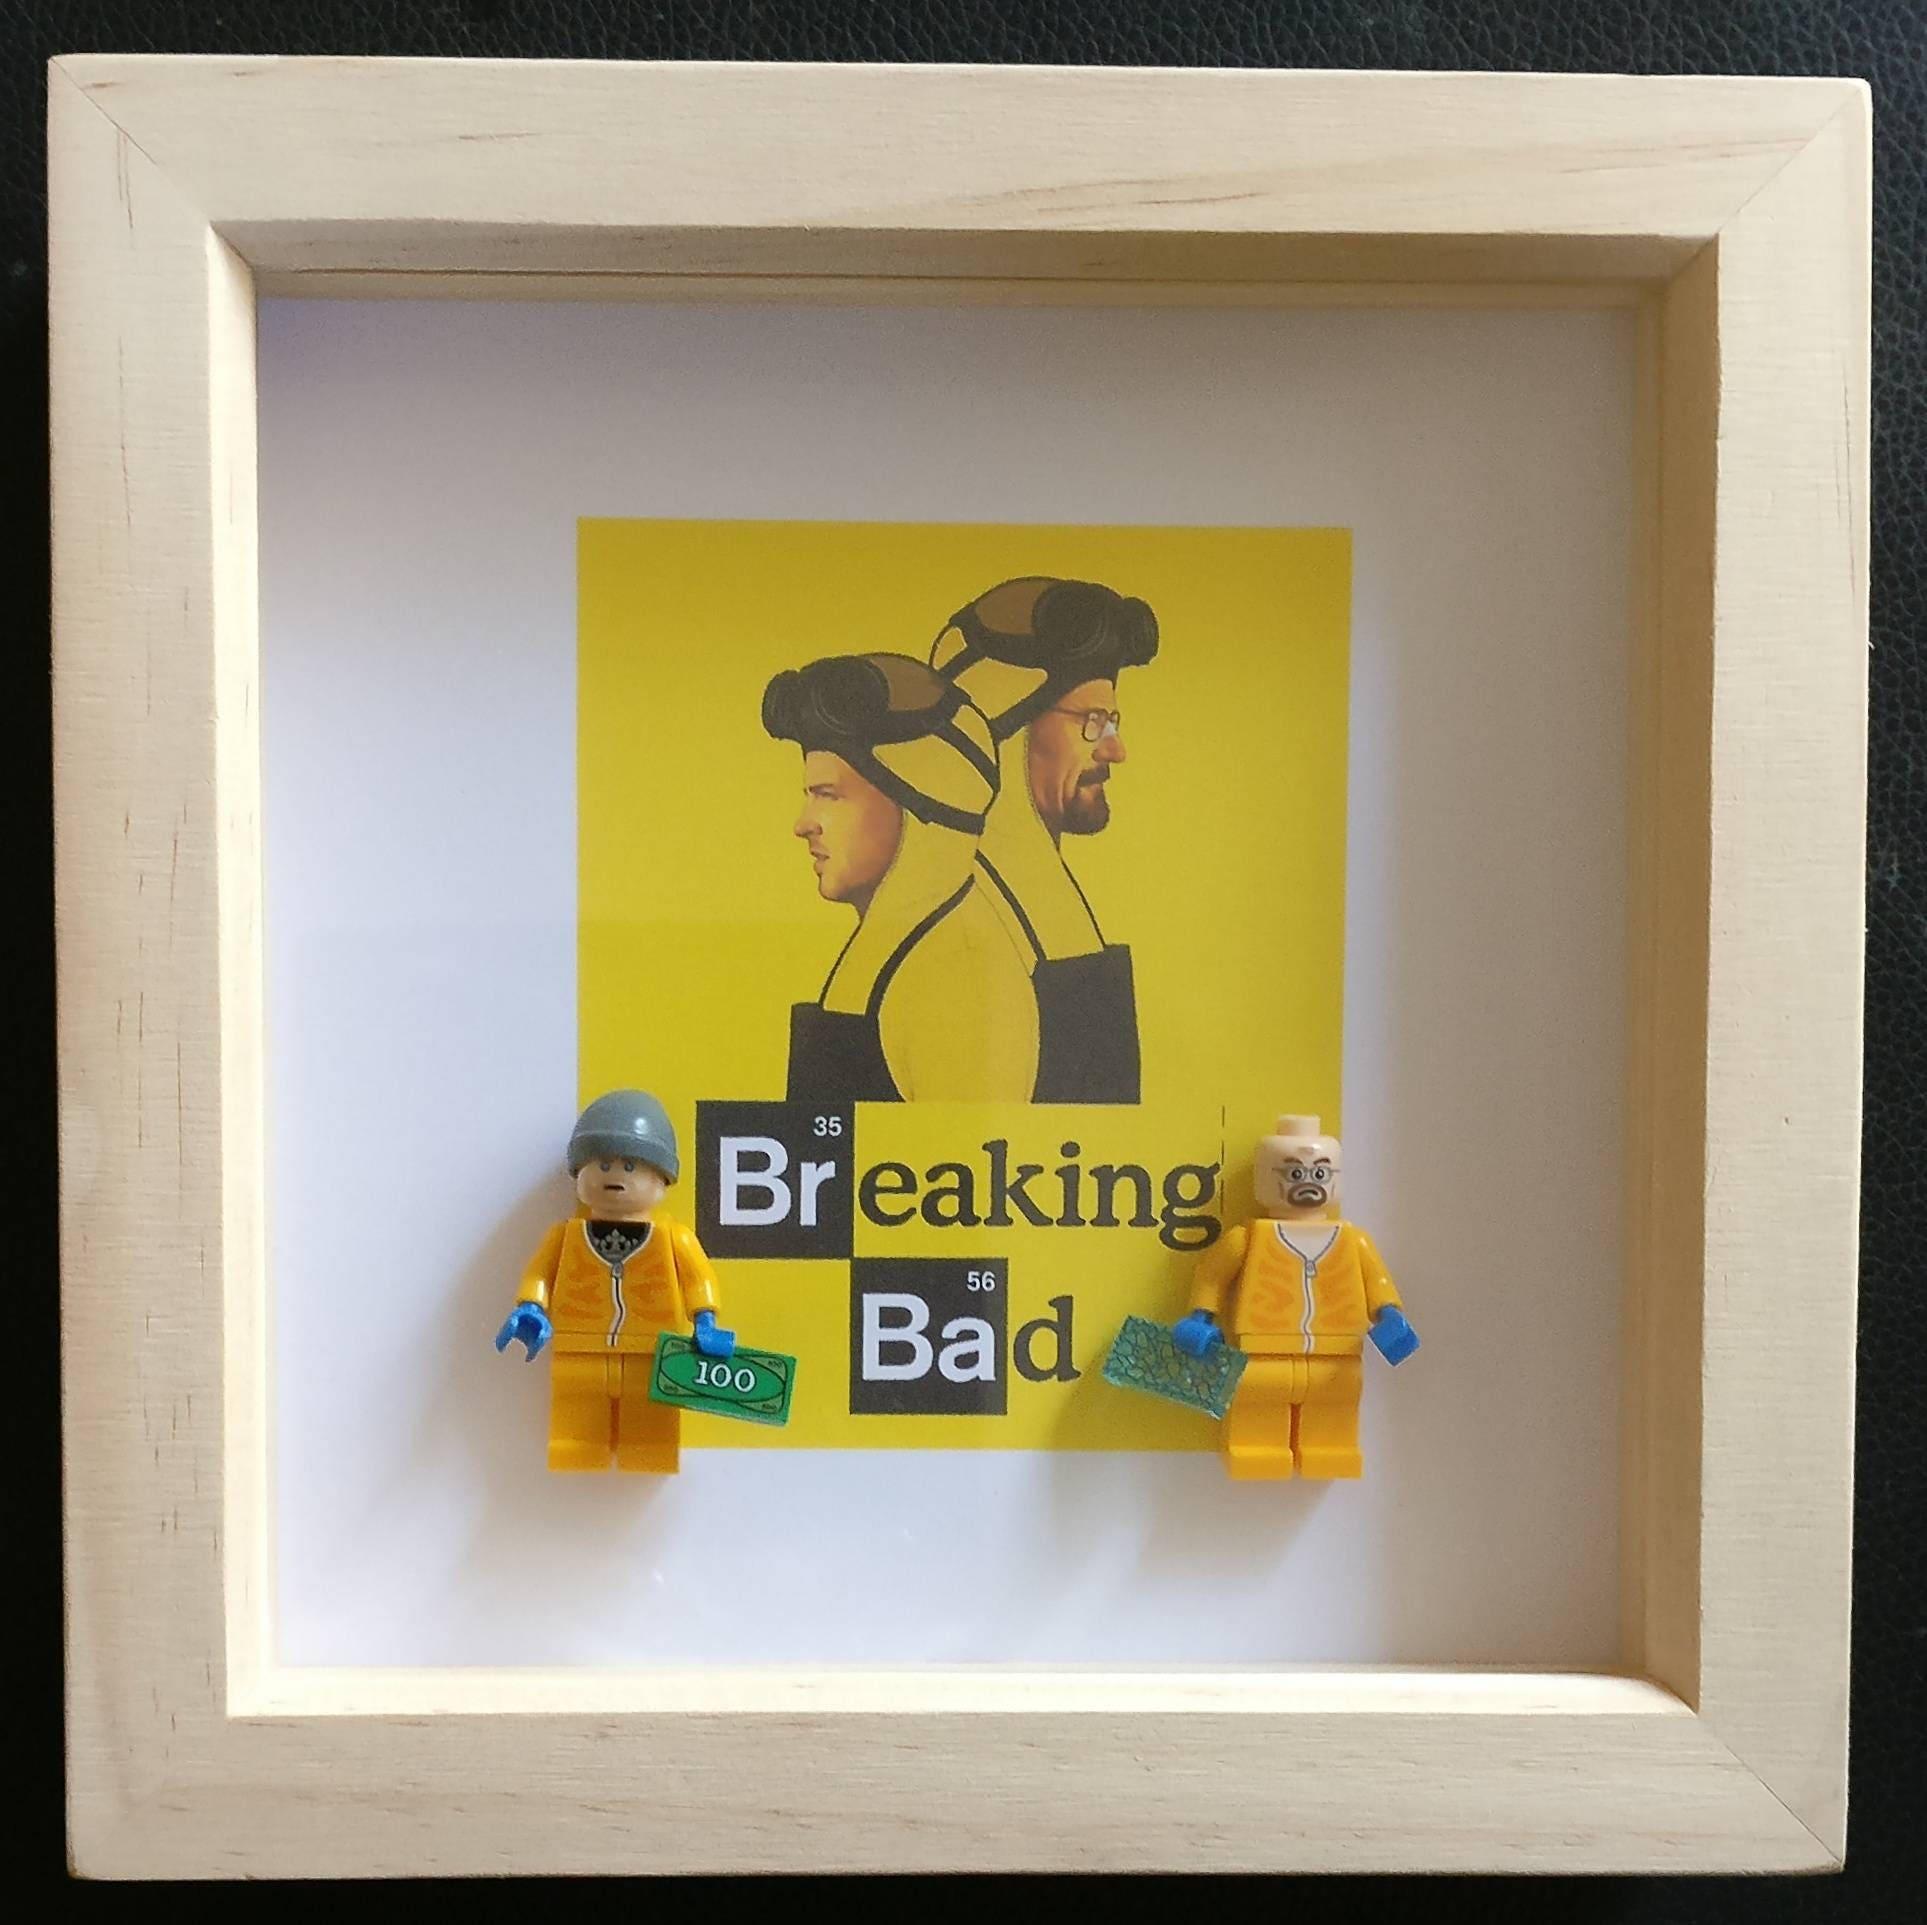 Lego inspired breaking bad walter and jesse minifigures framed description breaking bad jeuxipadfo Choice Image